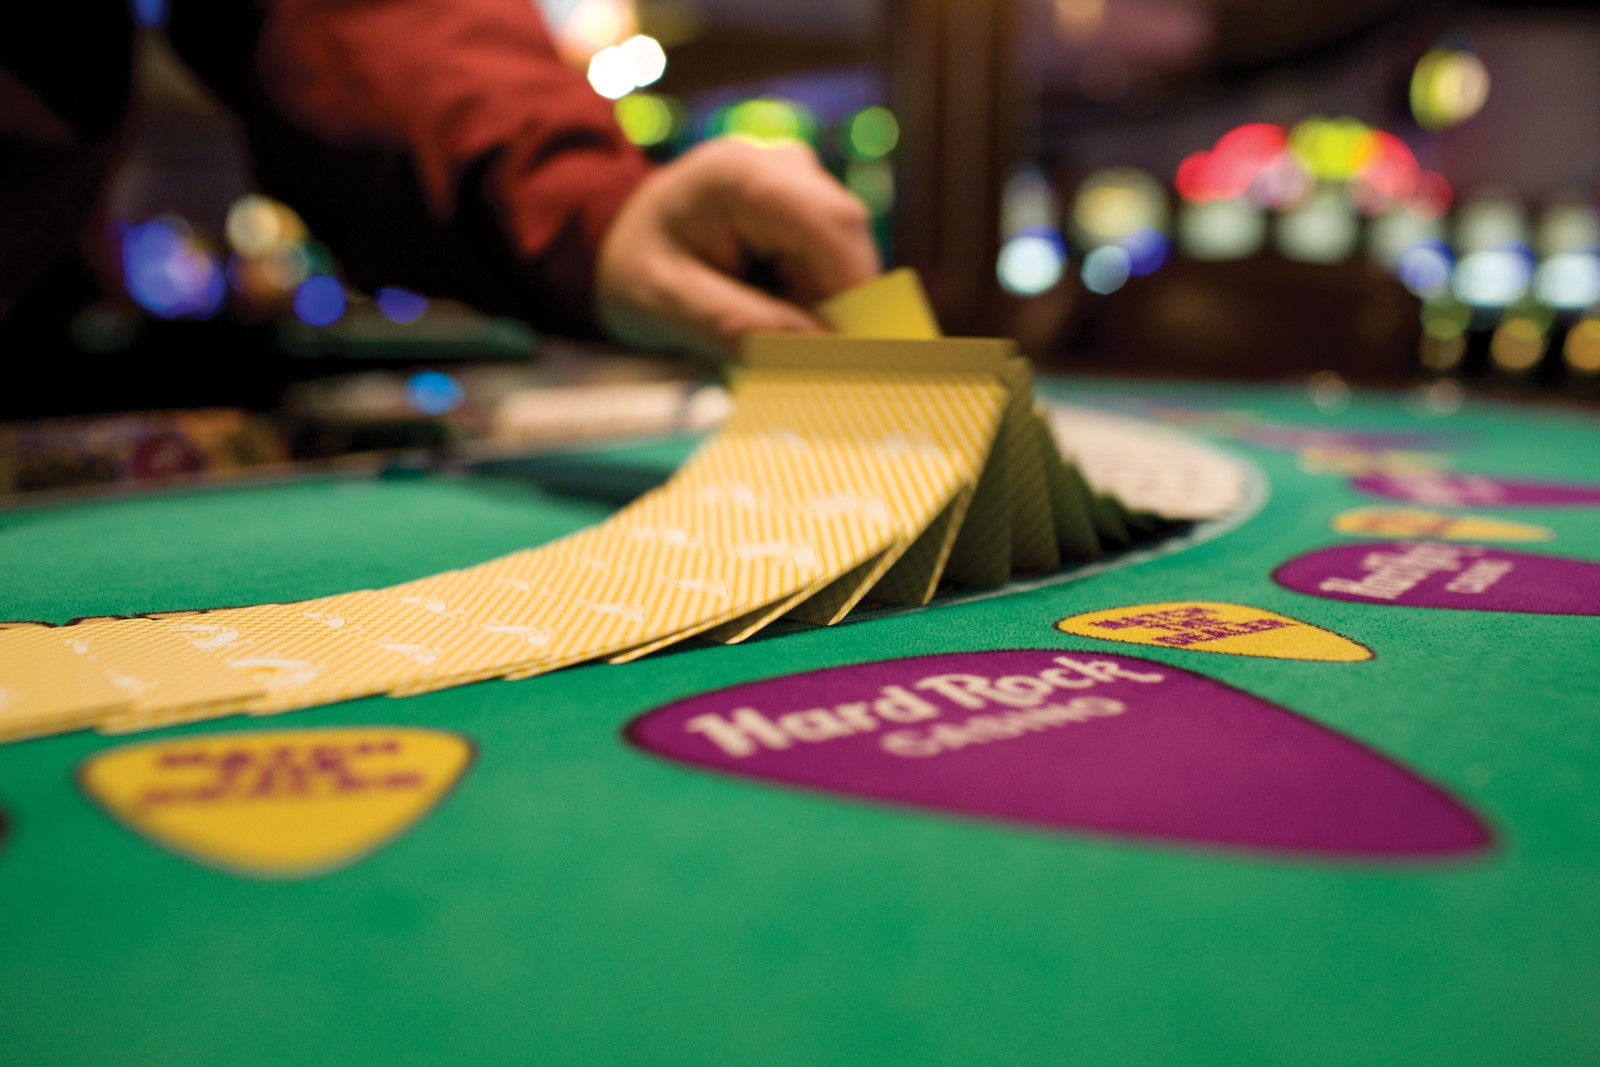 Slots Table Games Poker At Hard Rock Casino Punta Cana Dominican Republic